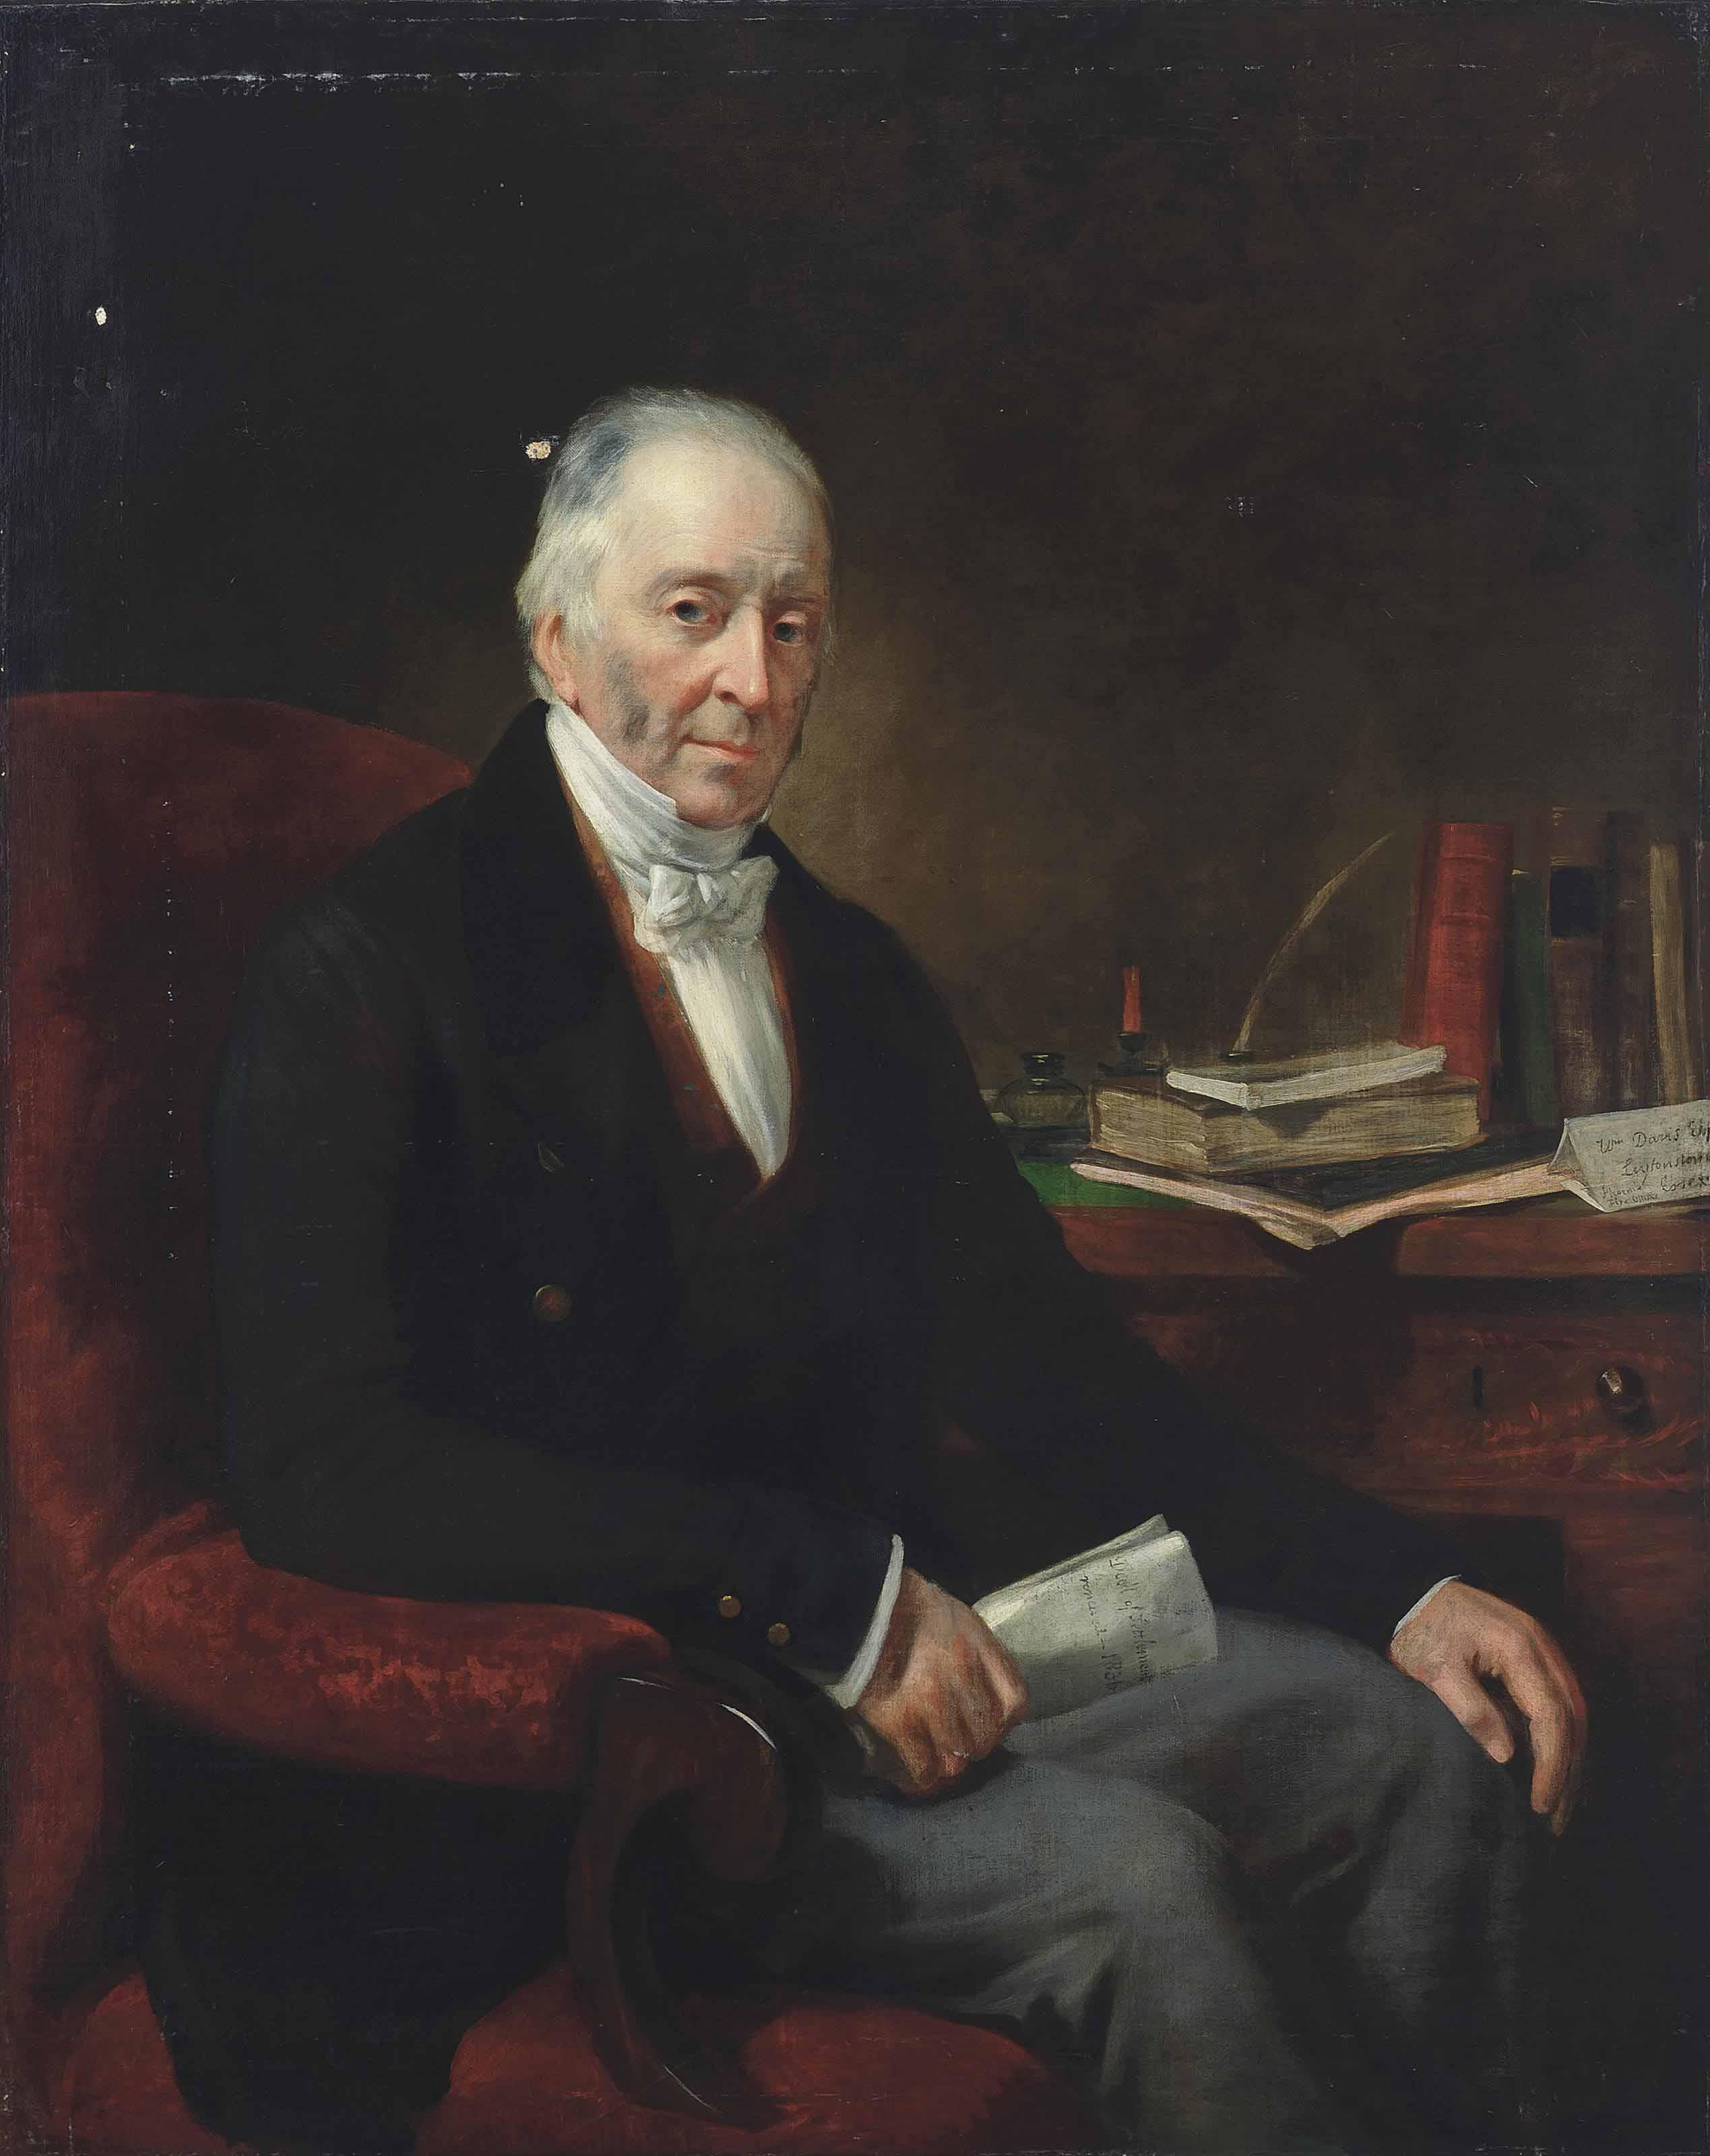 Portrait of William Davis of Leytonstone, seated at his desk, three-quarter length